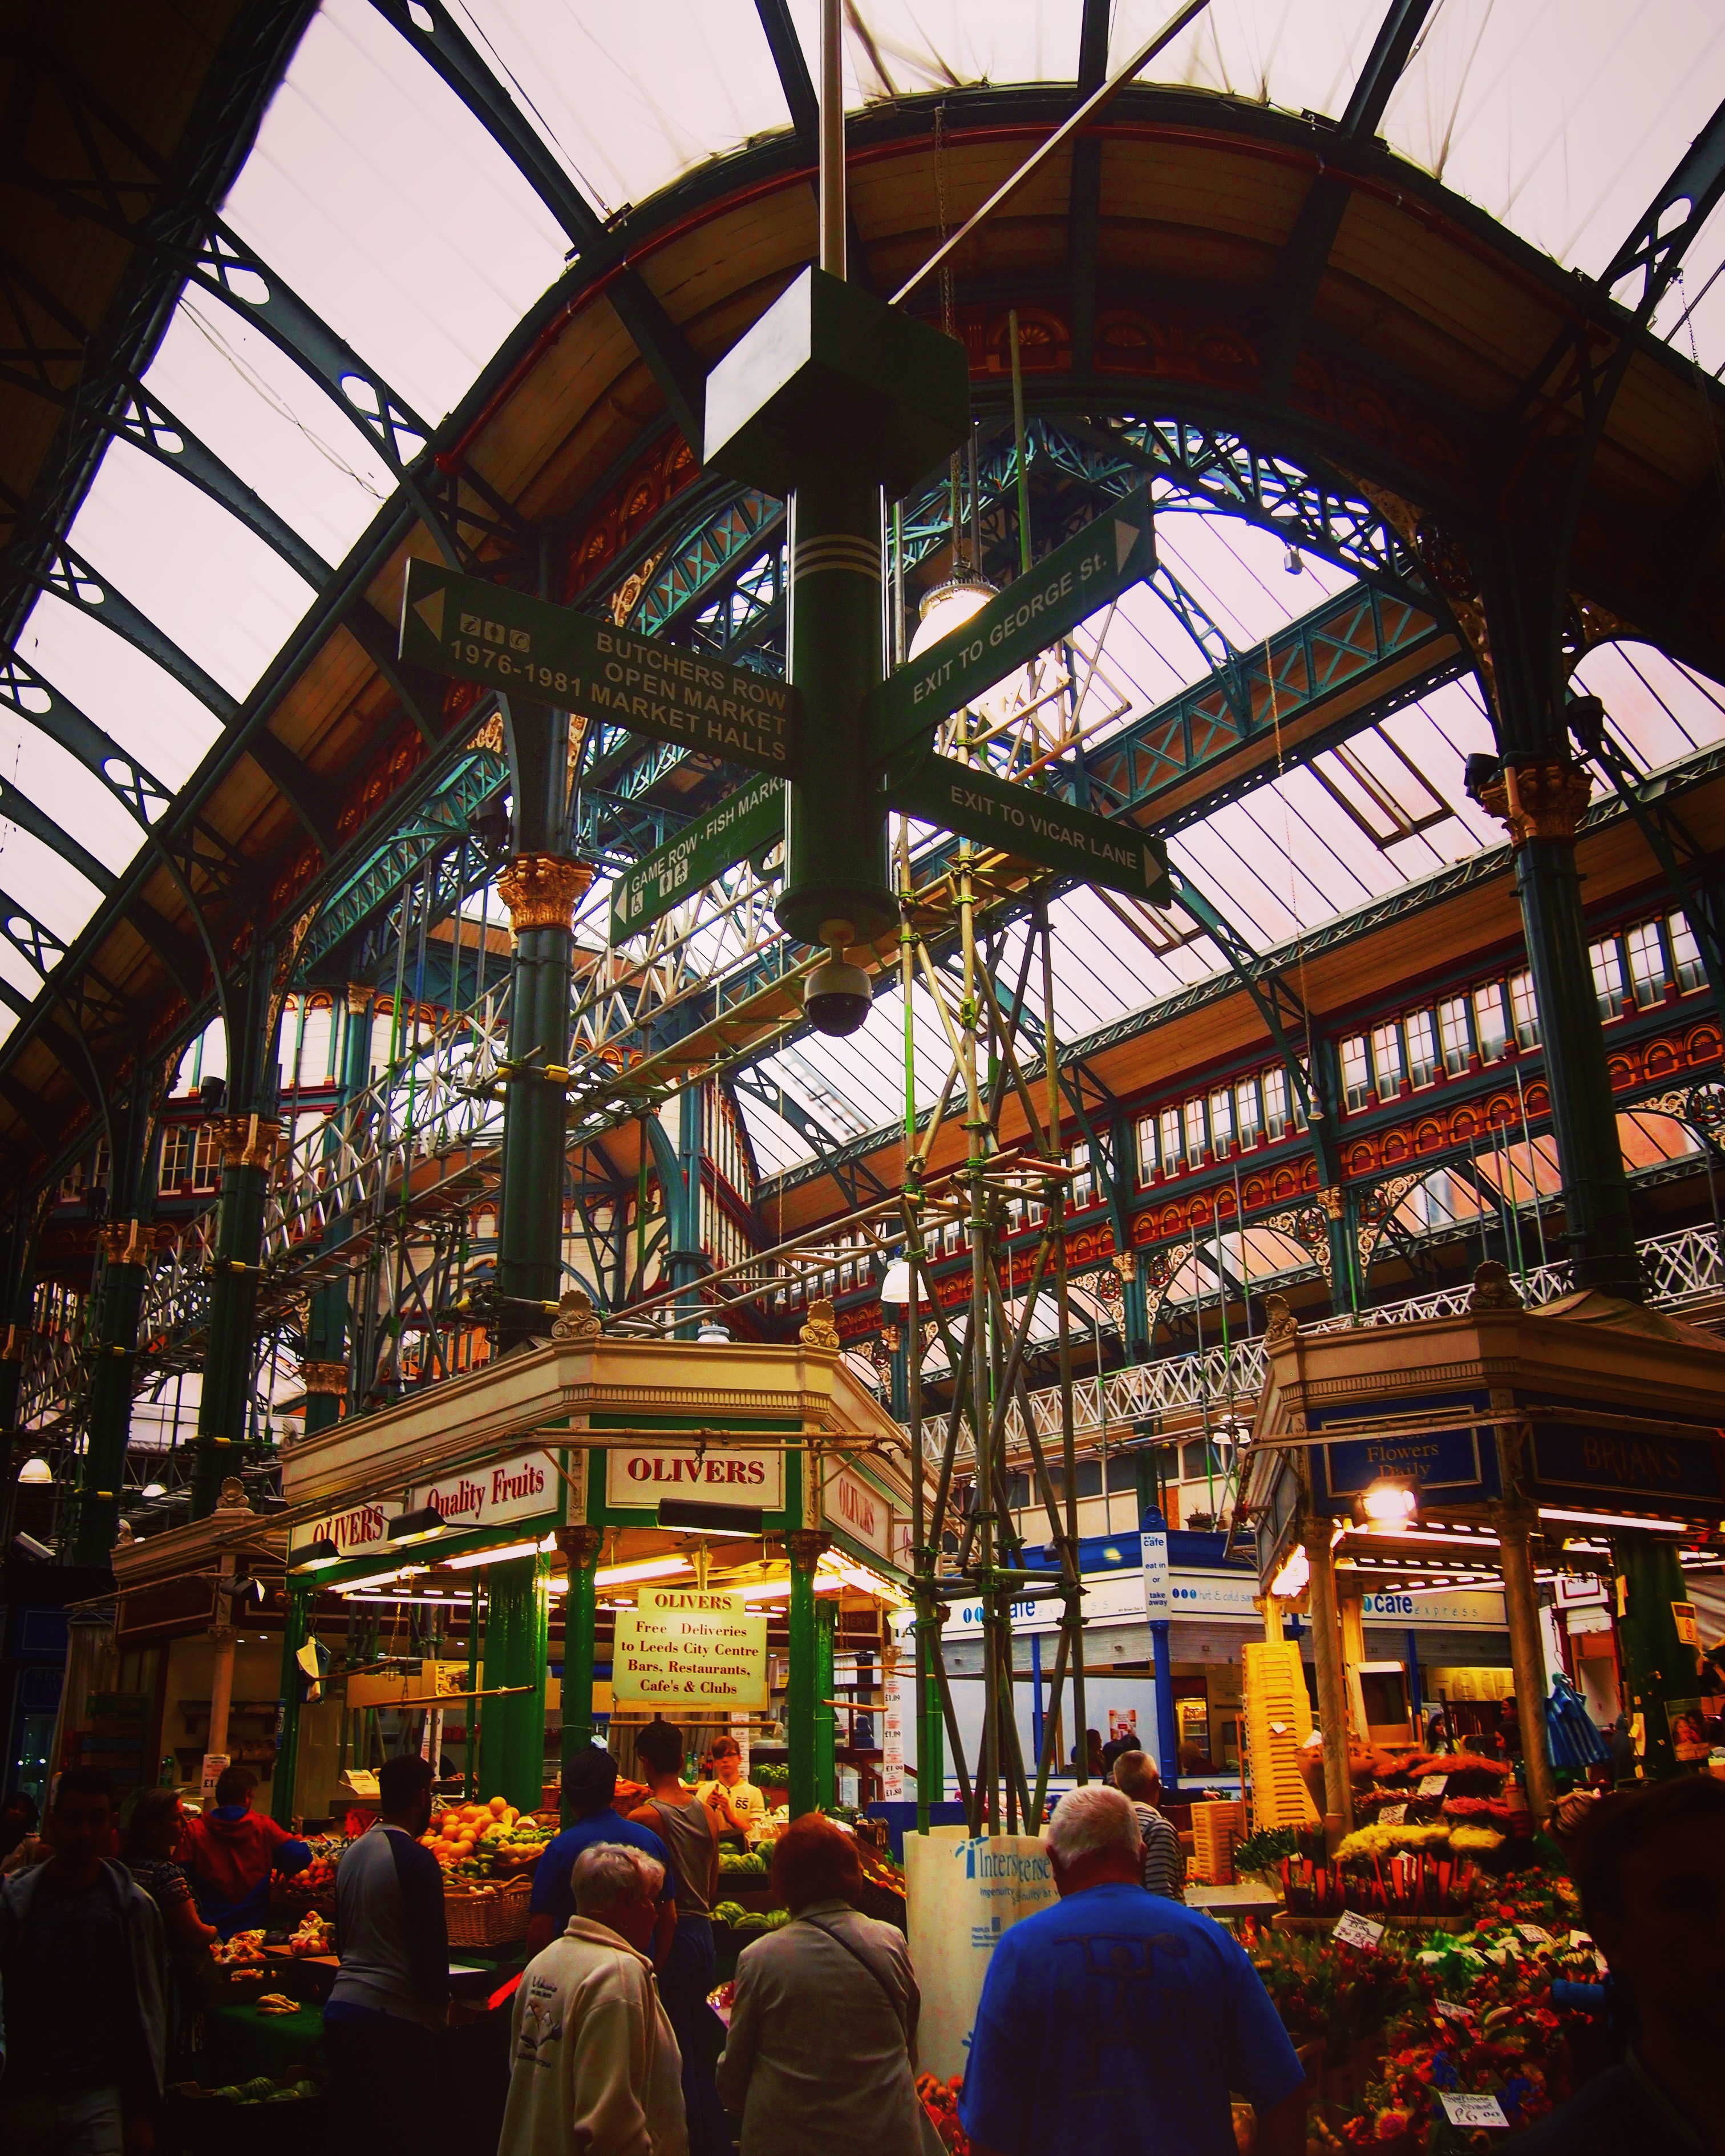 Leeds City Market, Leeds, UK [Photo]